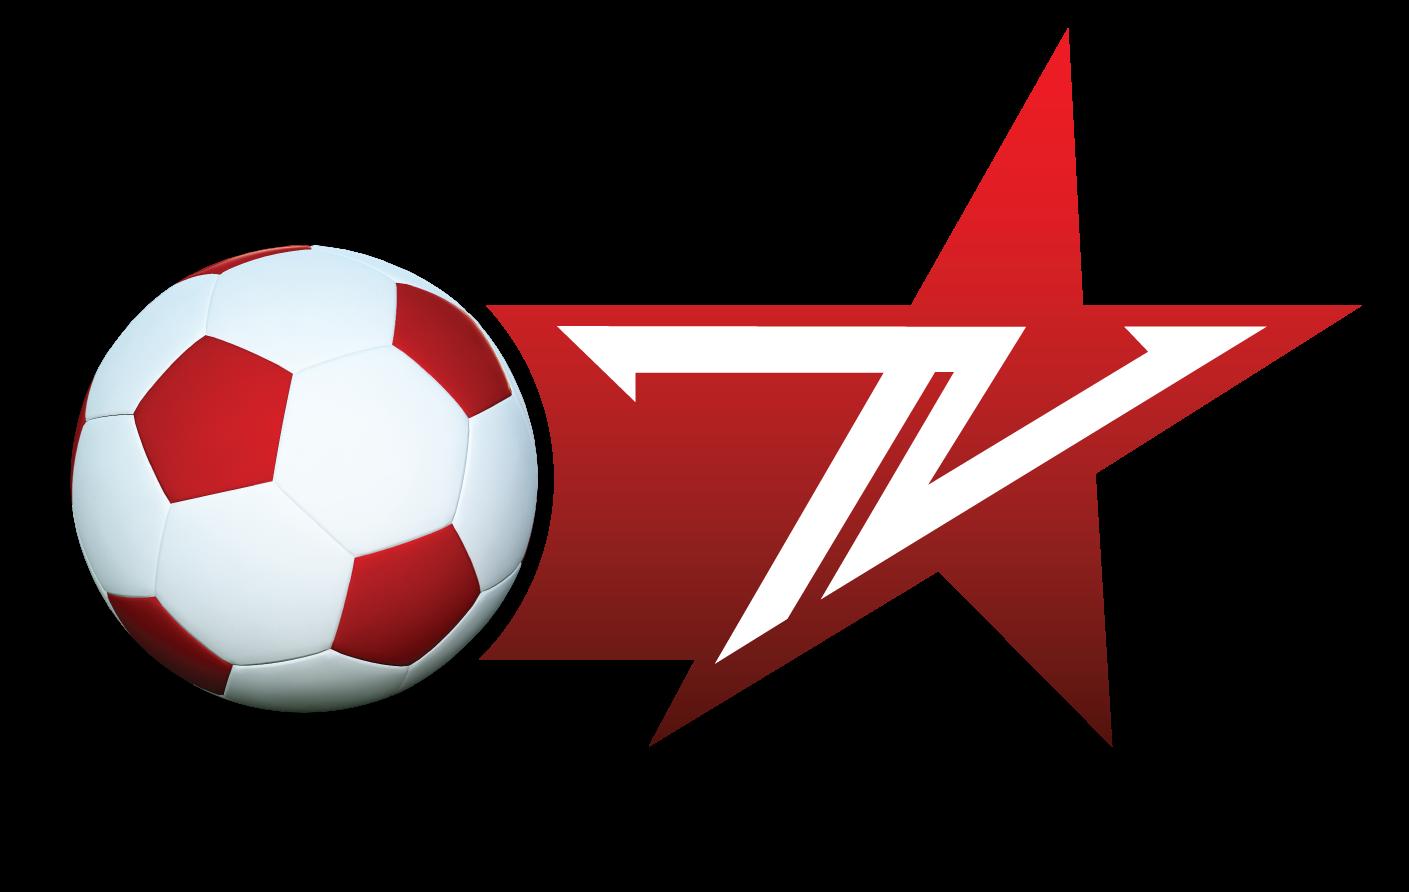 VTVcab 16 (Bóng Đá TV)